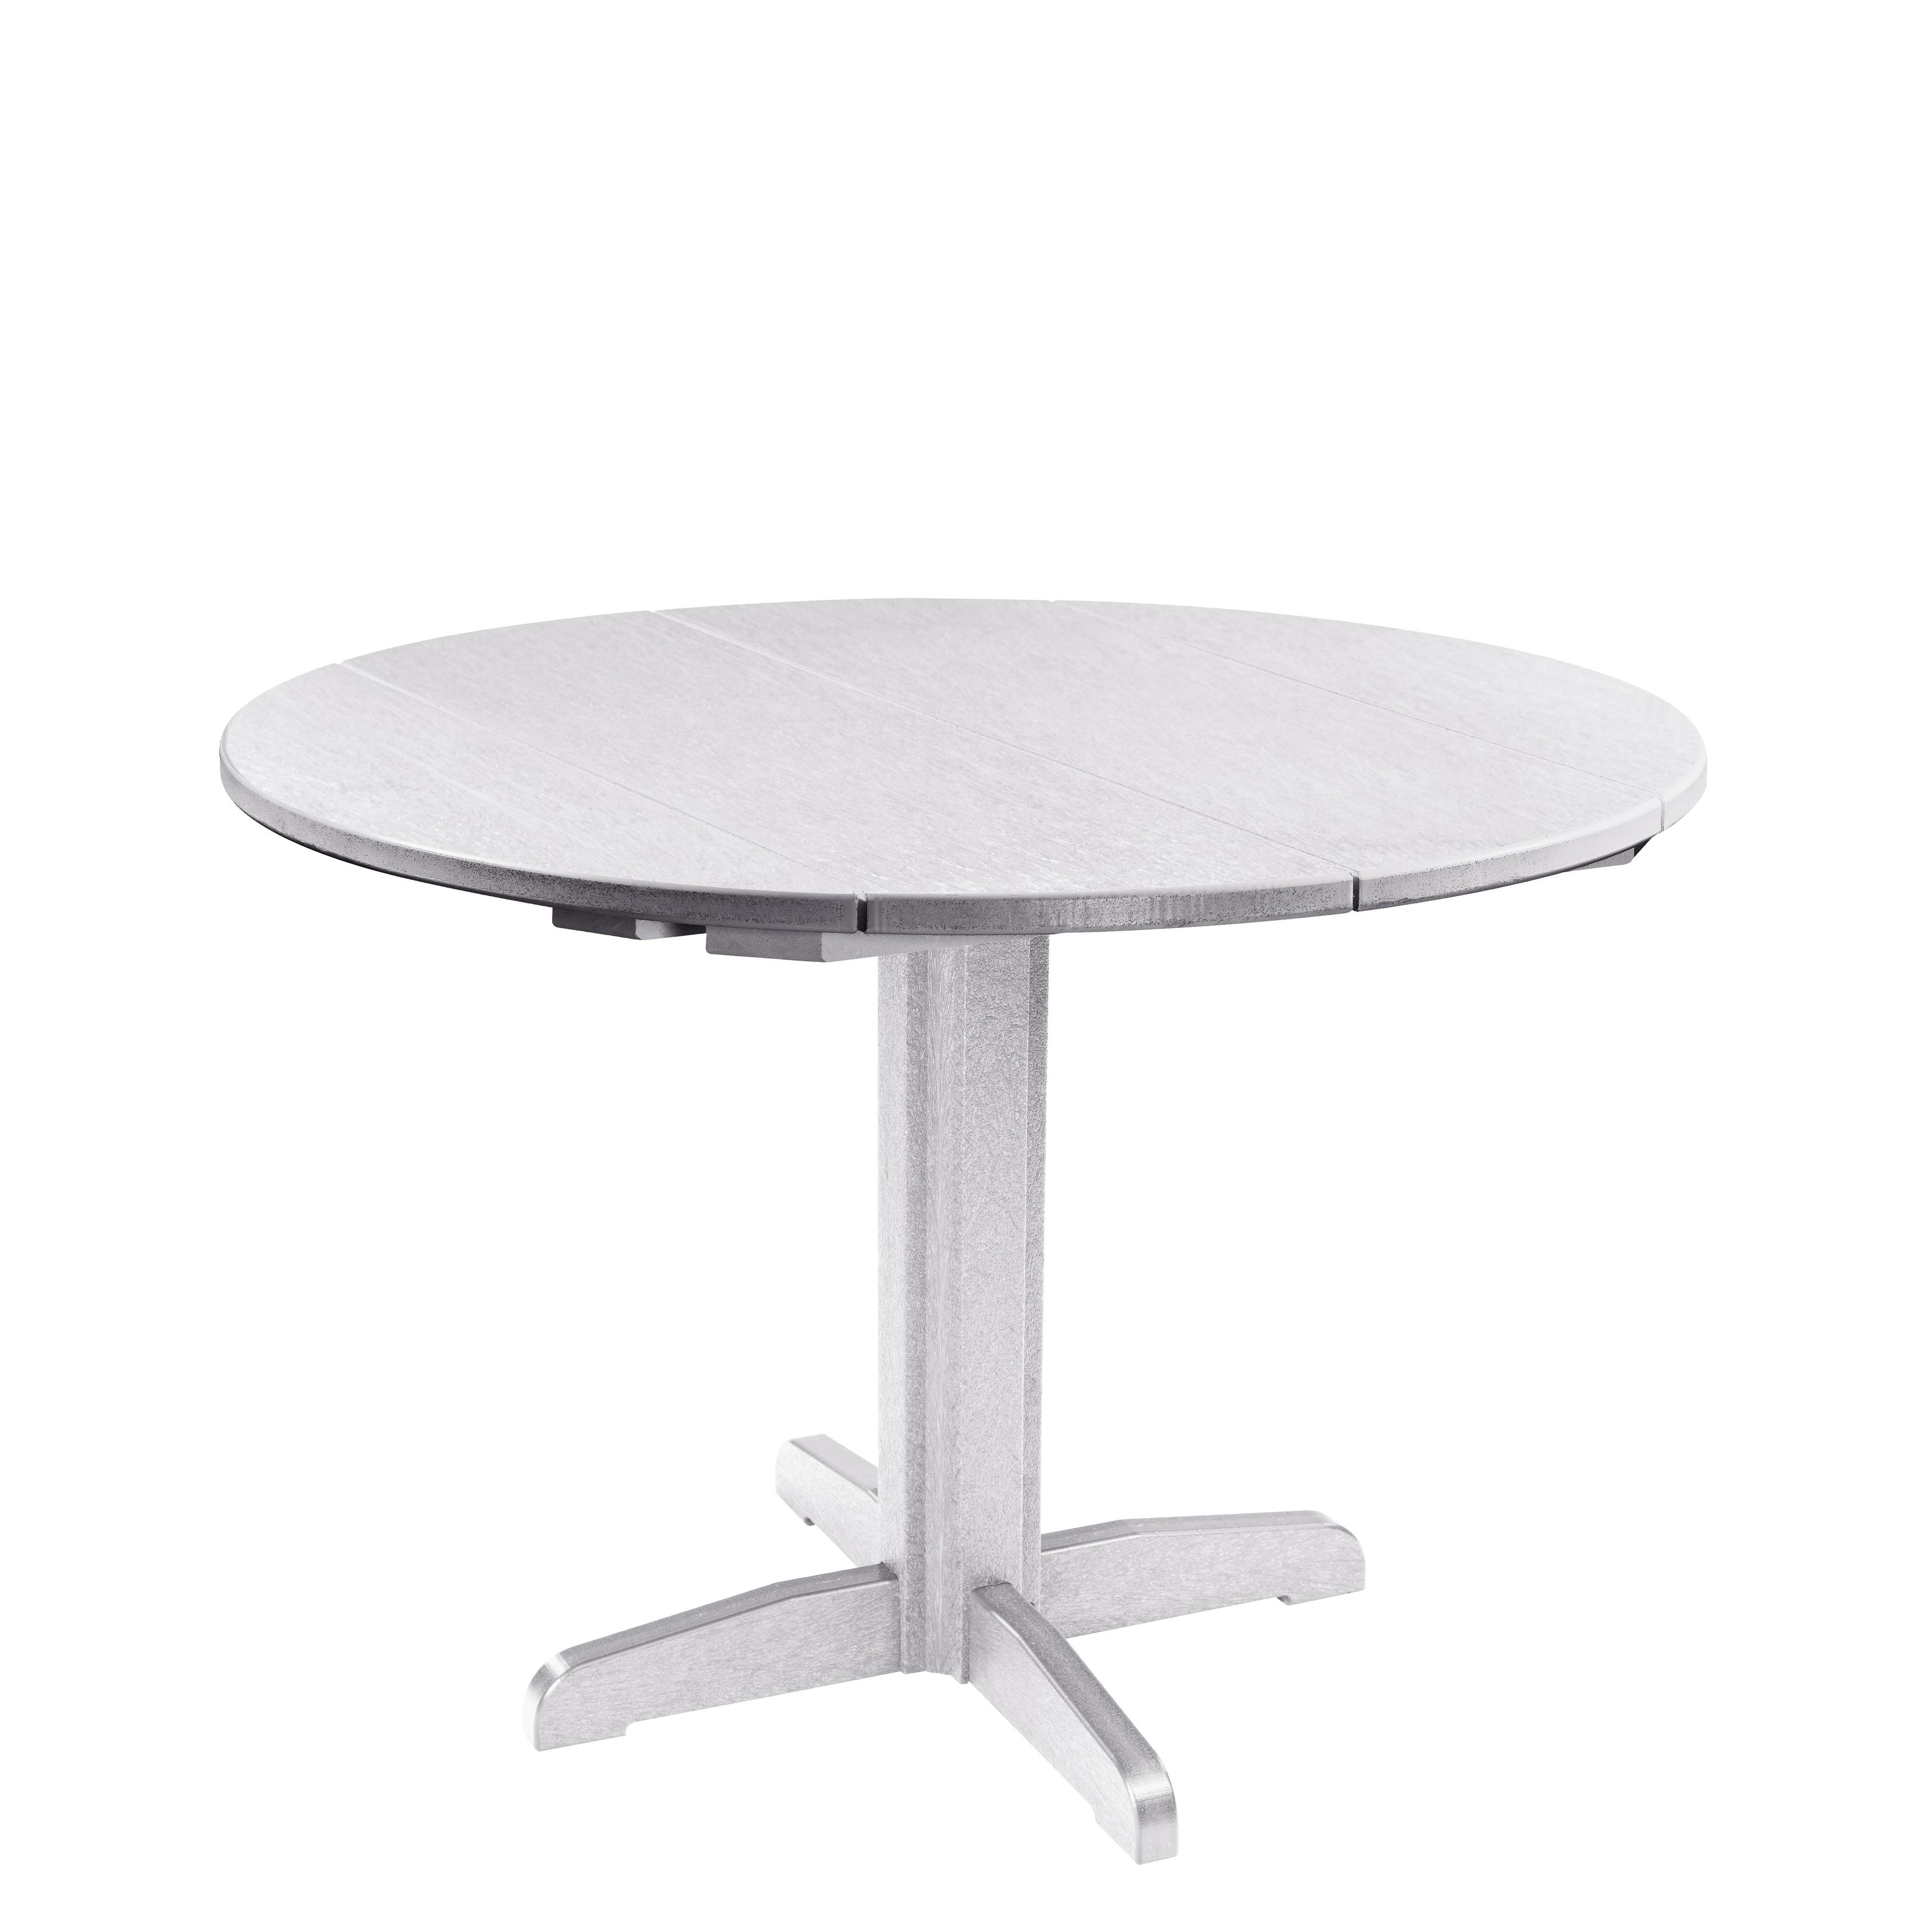 C R Plastics Generation 40 Round Table Top W 30 Dining Pedestal Base